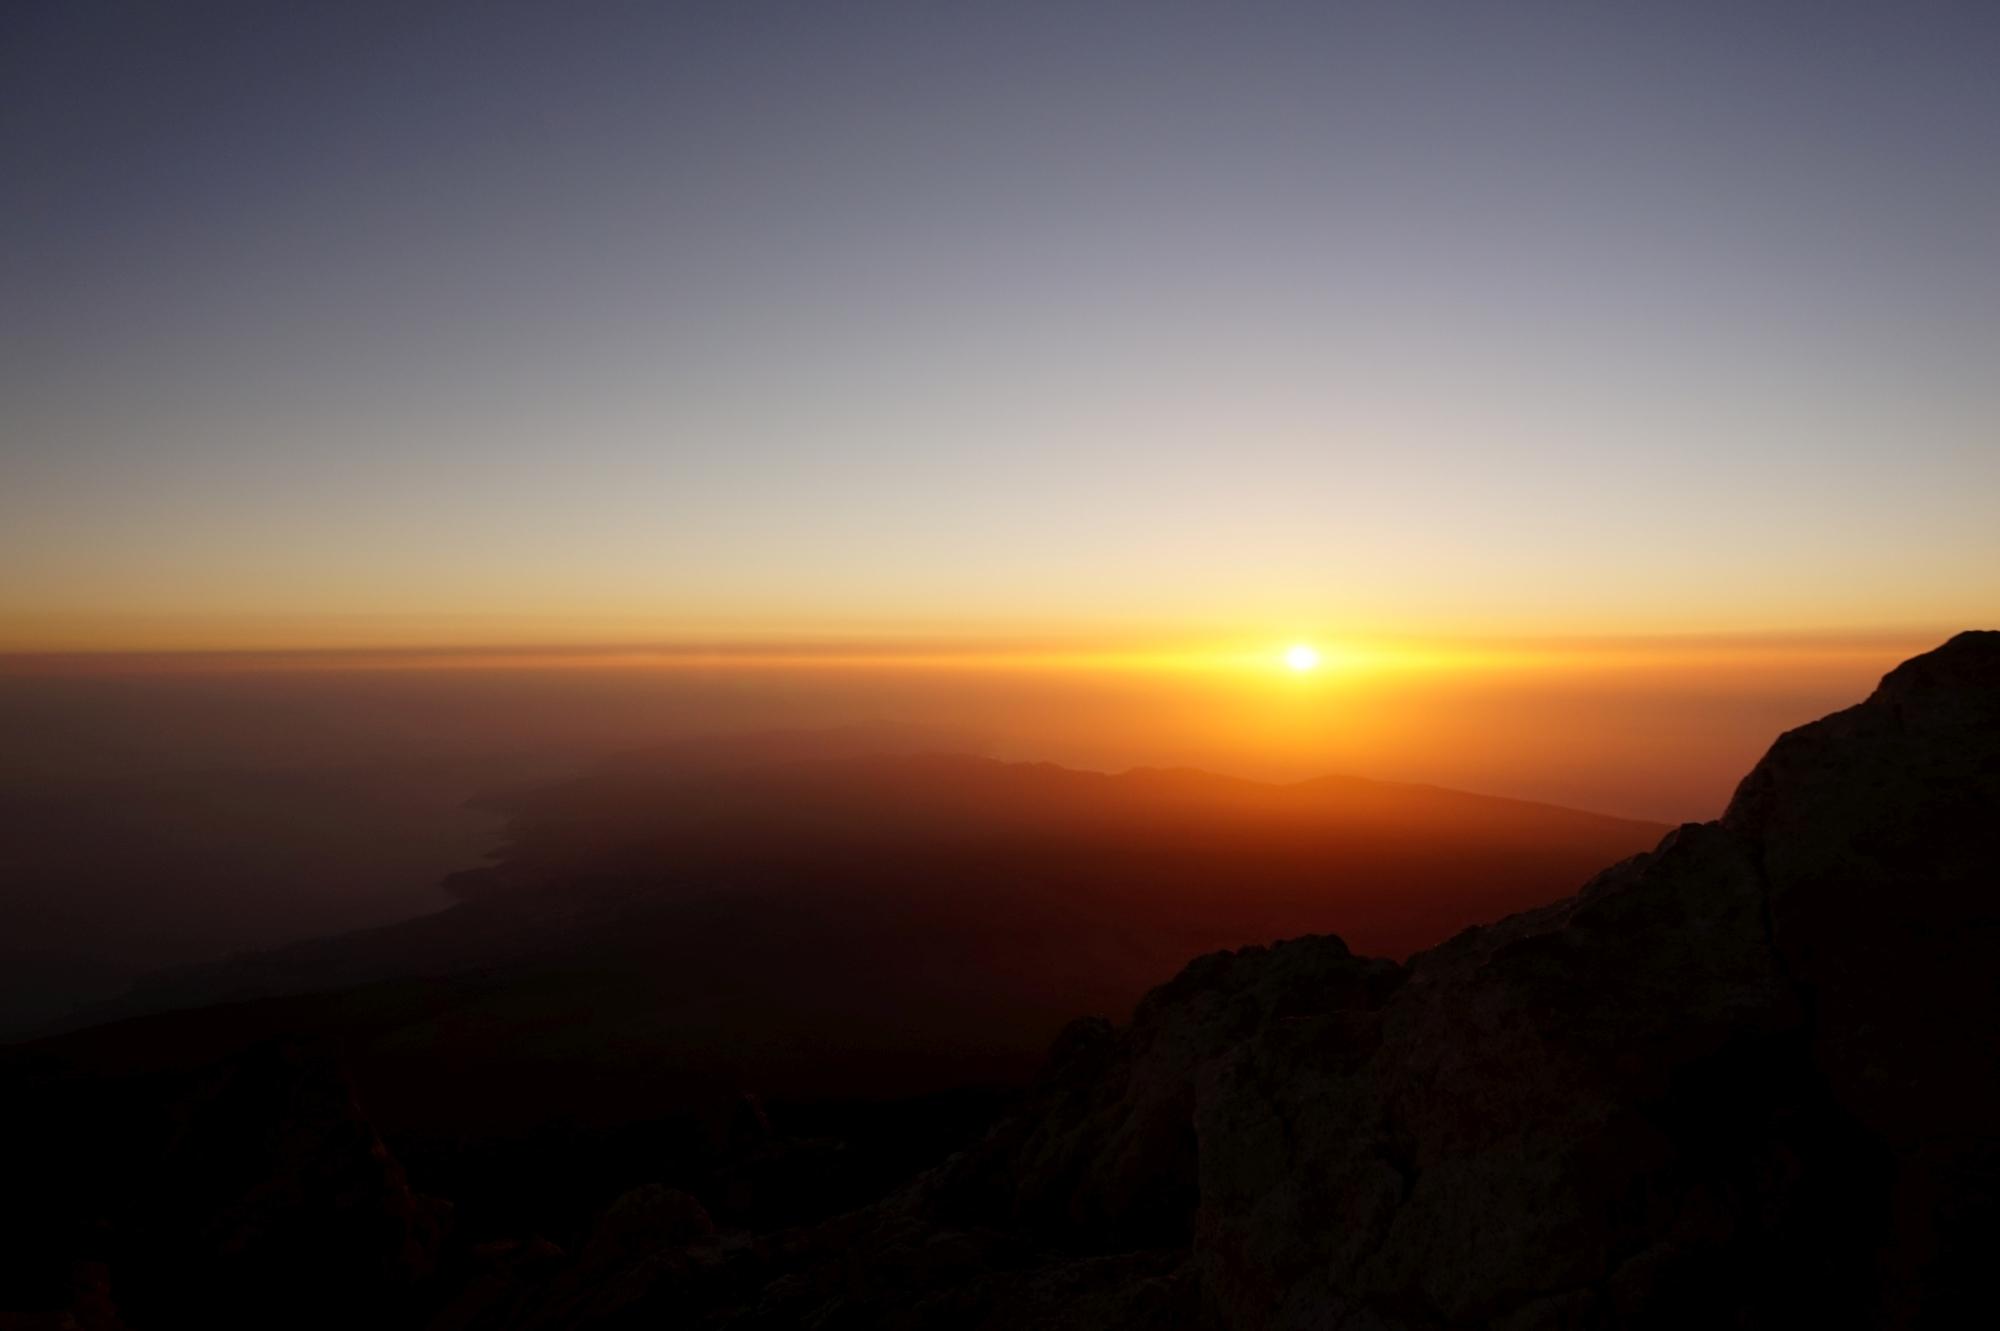 Wejście na wulkan Teide